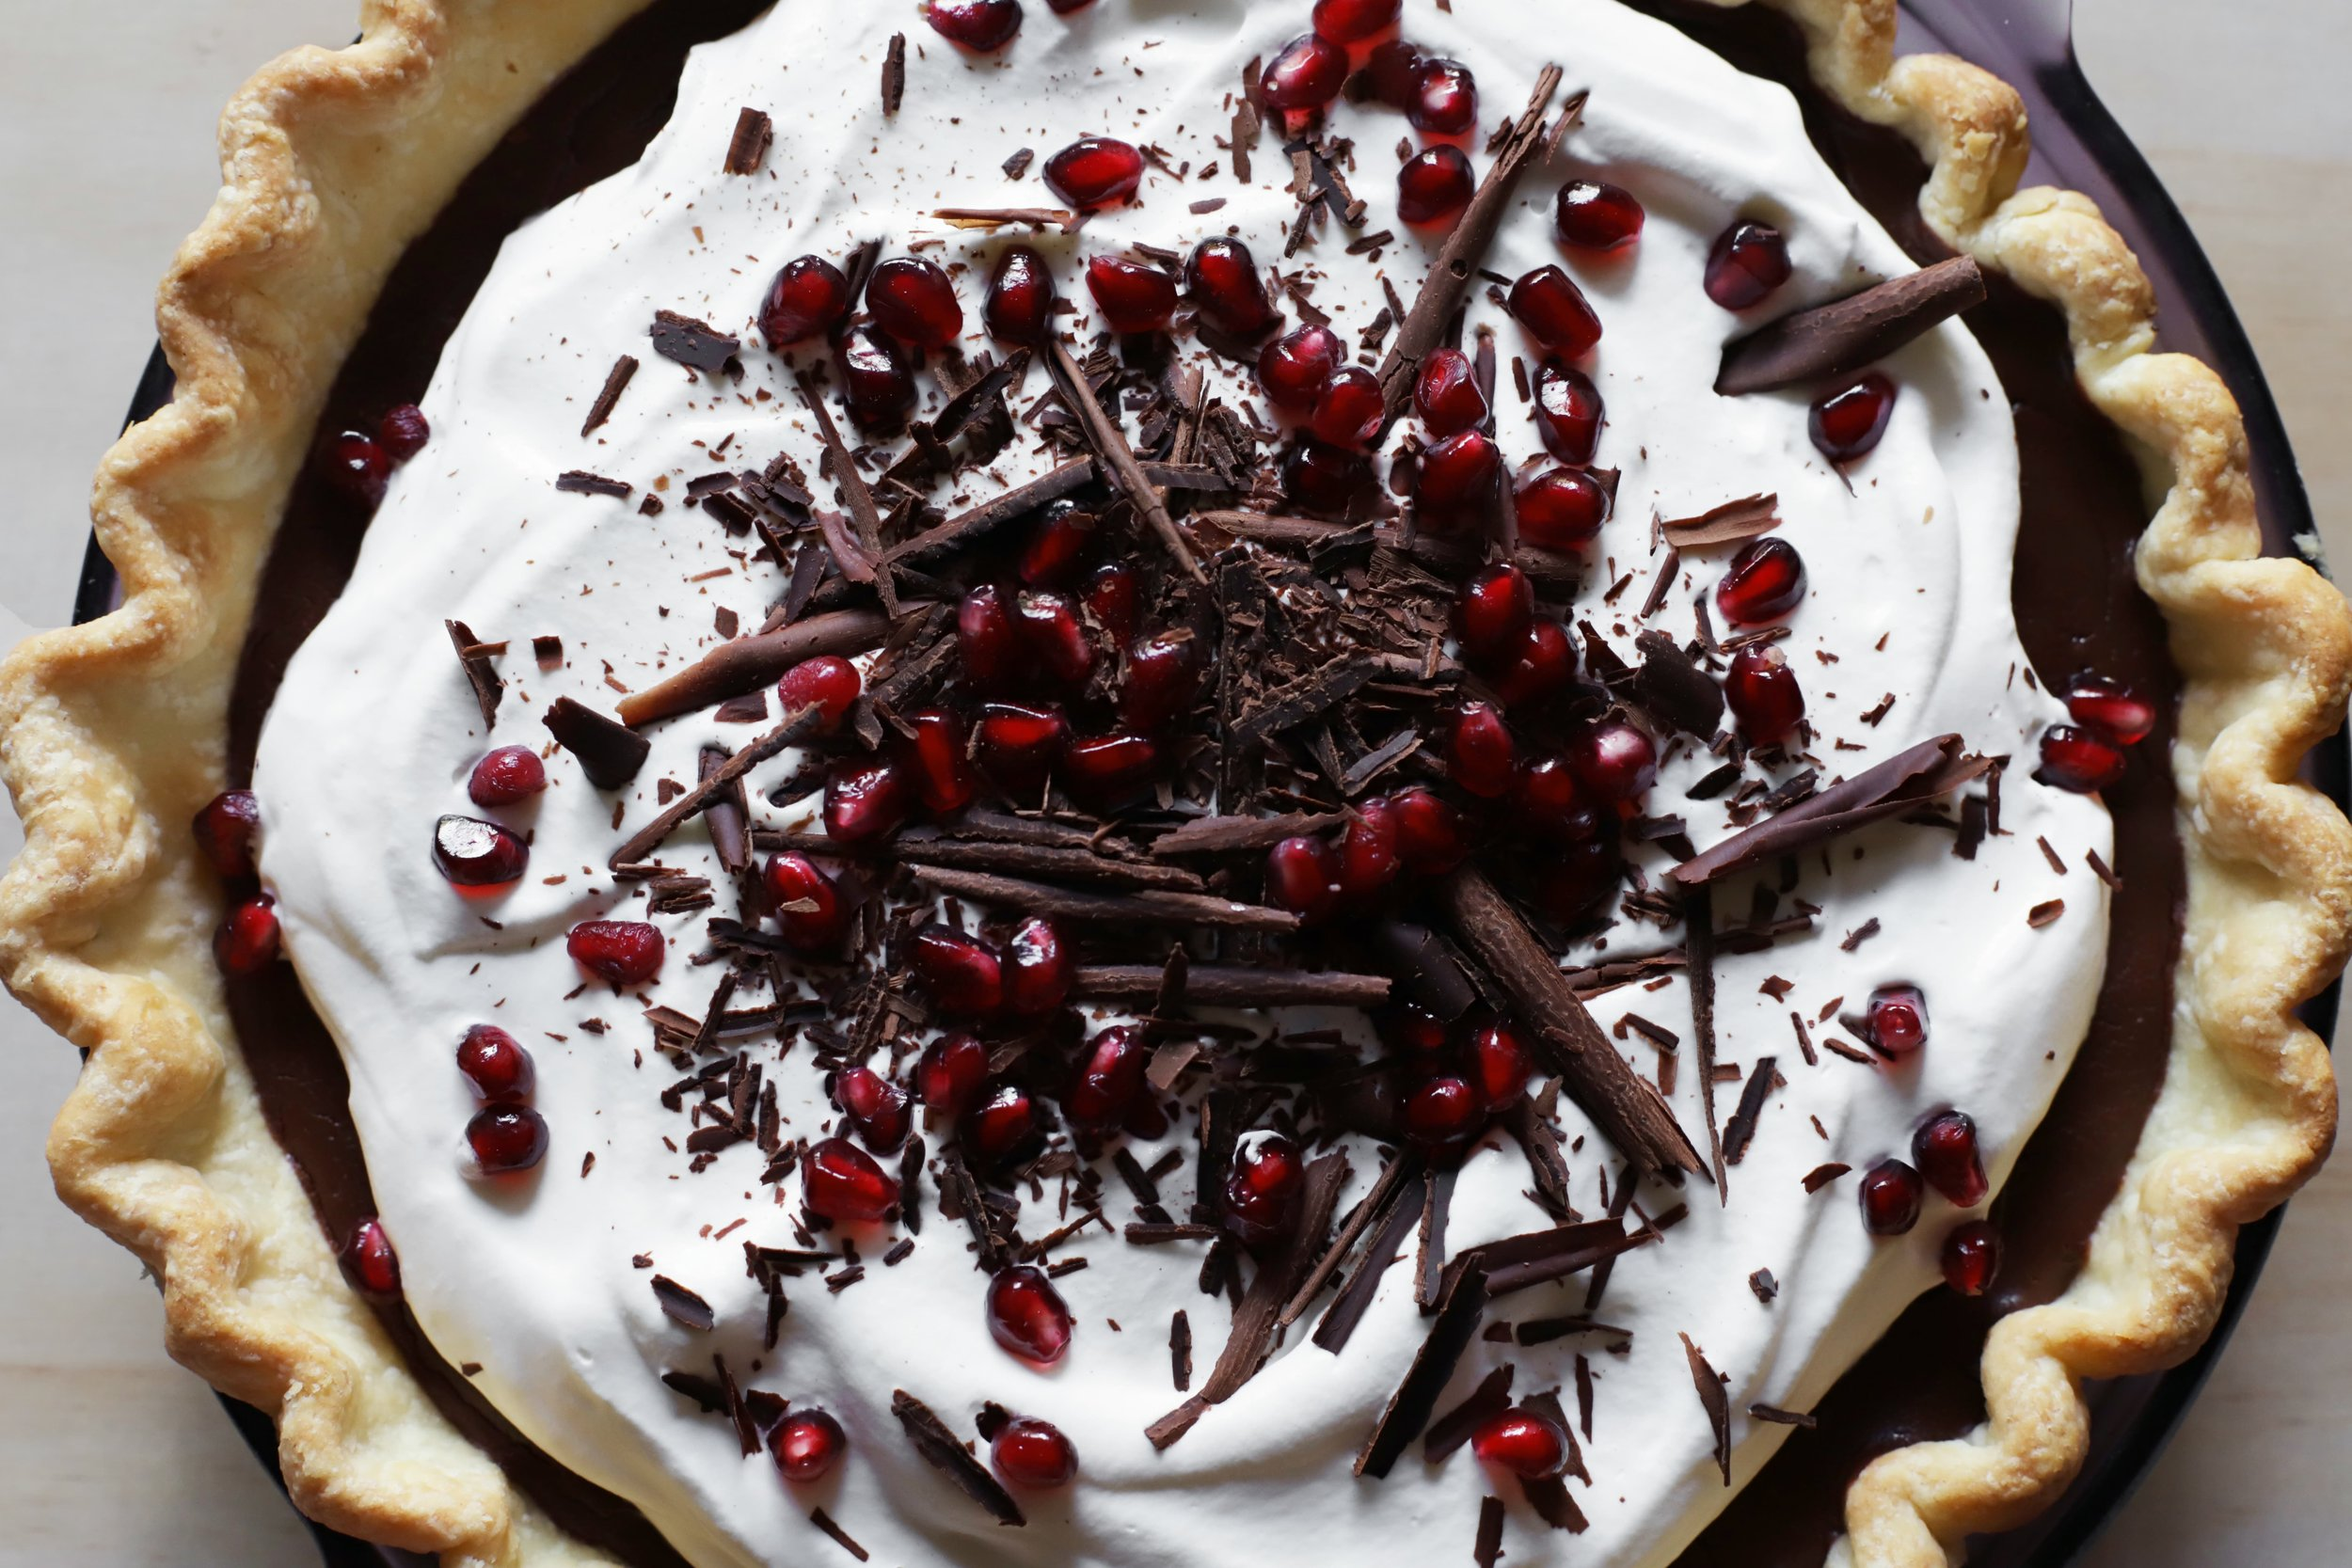 pomegranate chocolate cream pie